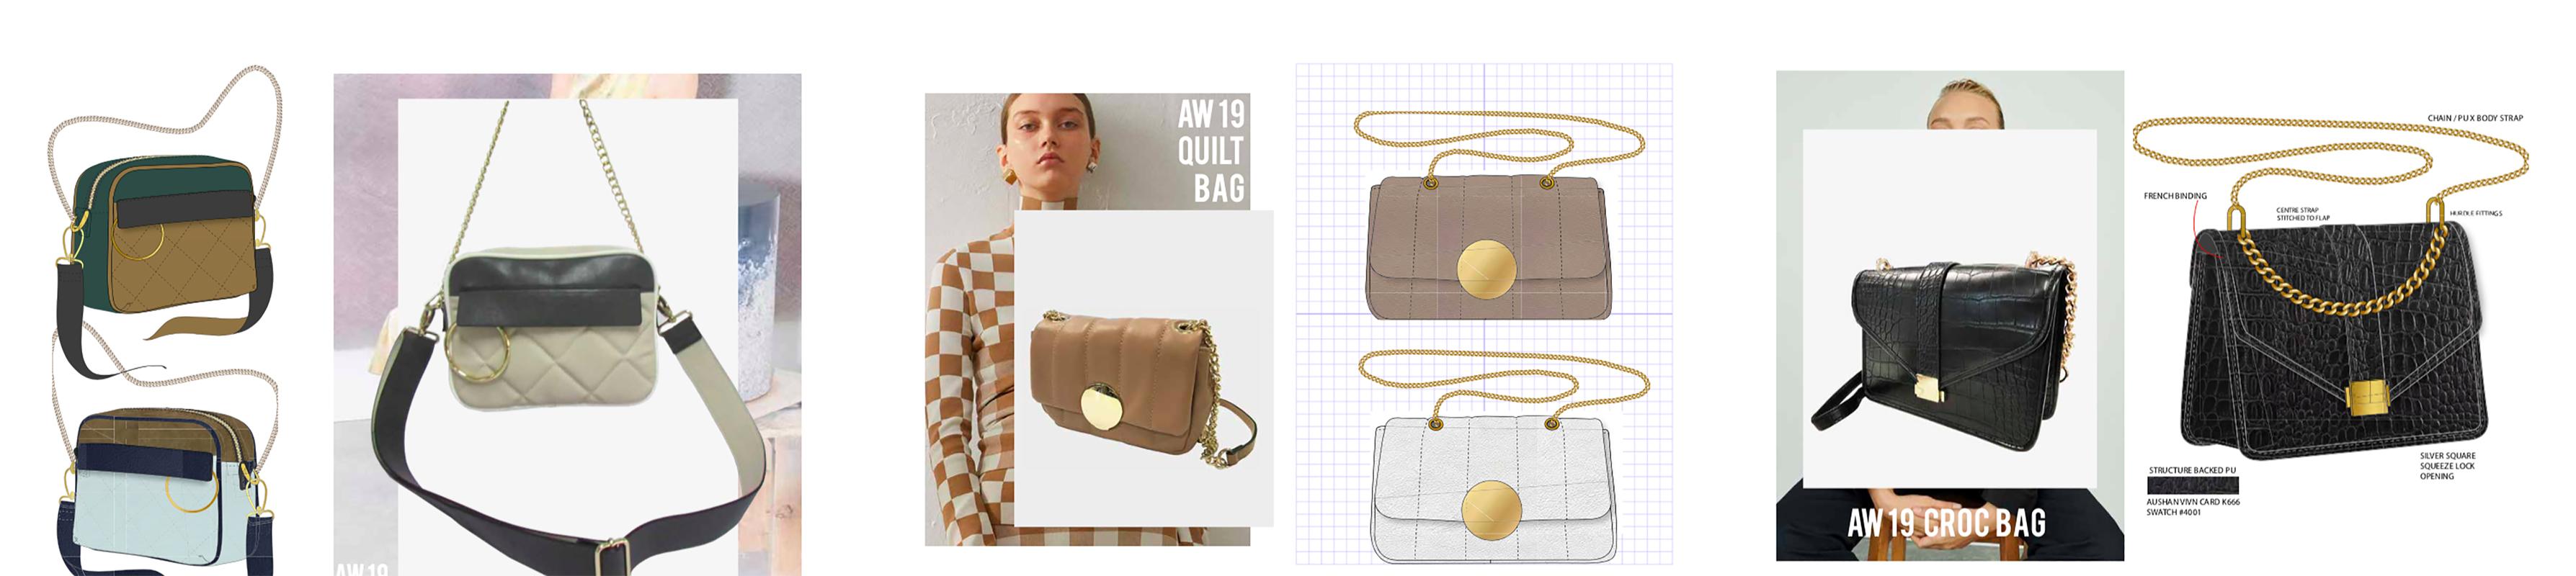 Collage of handbag design prototypes